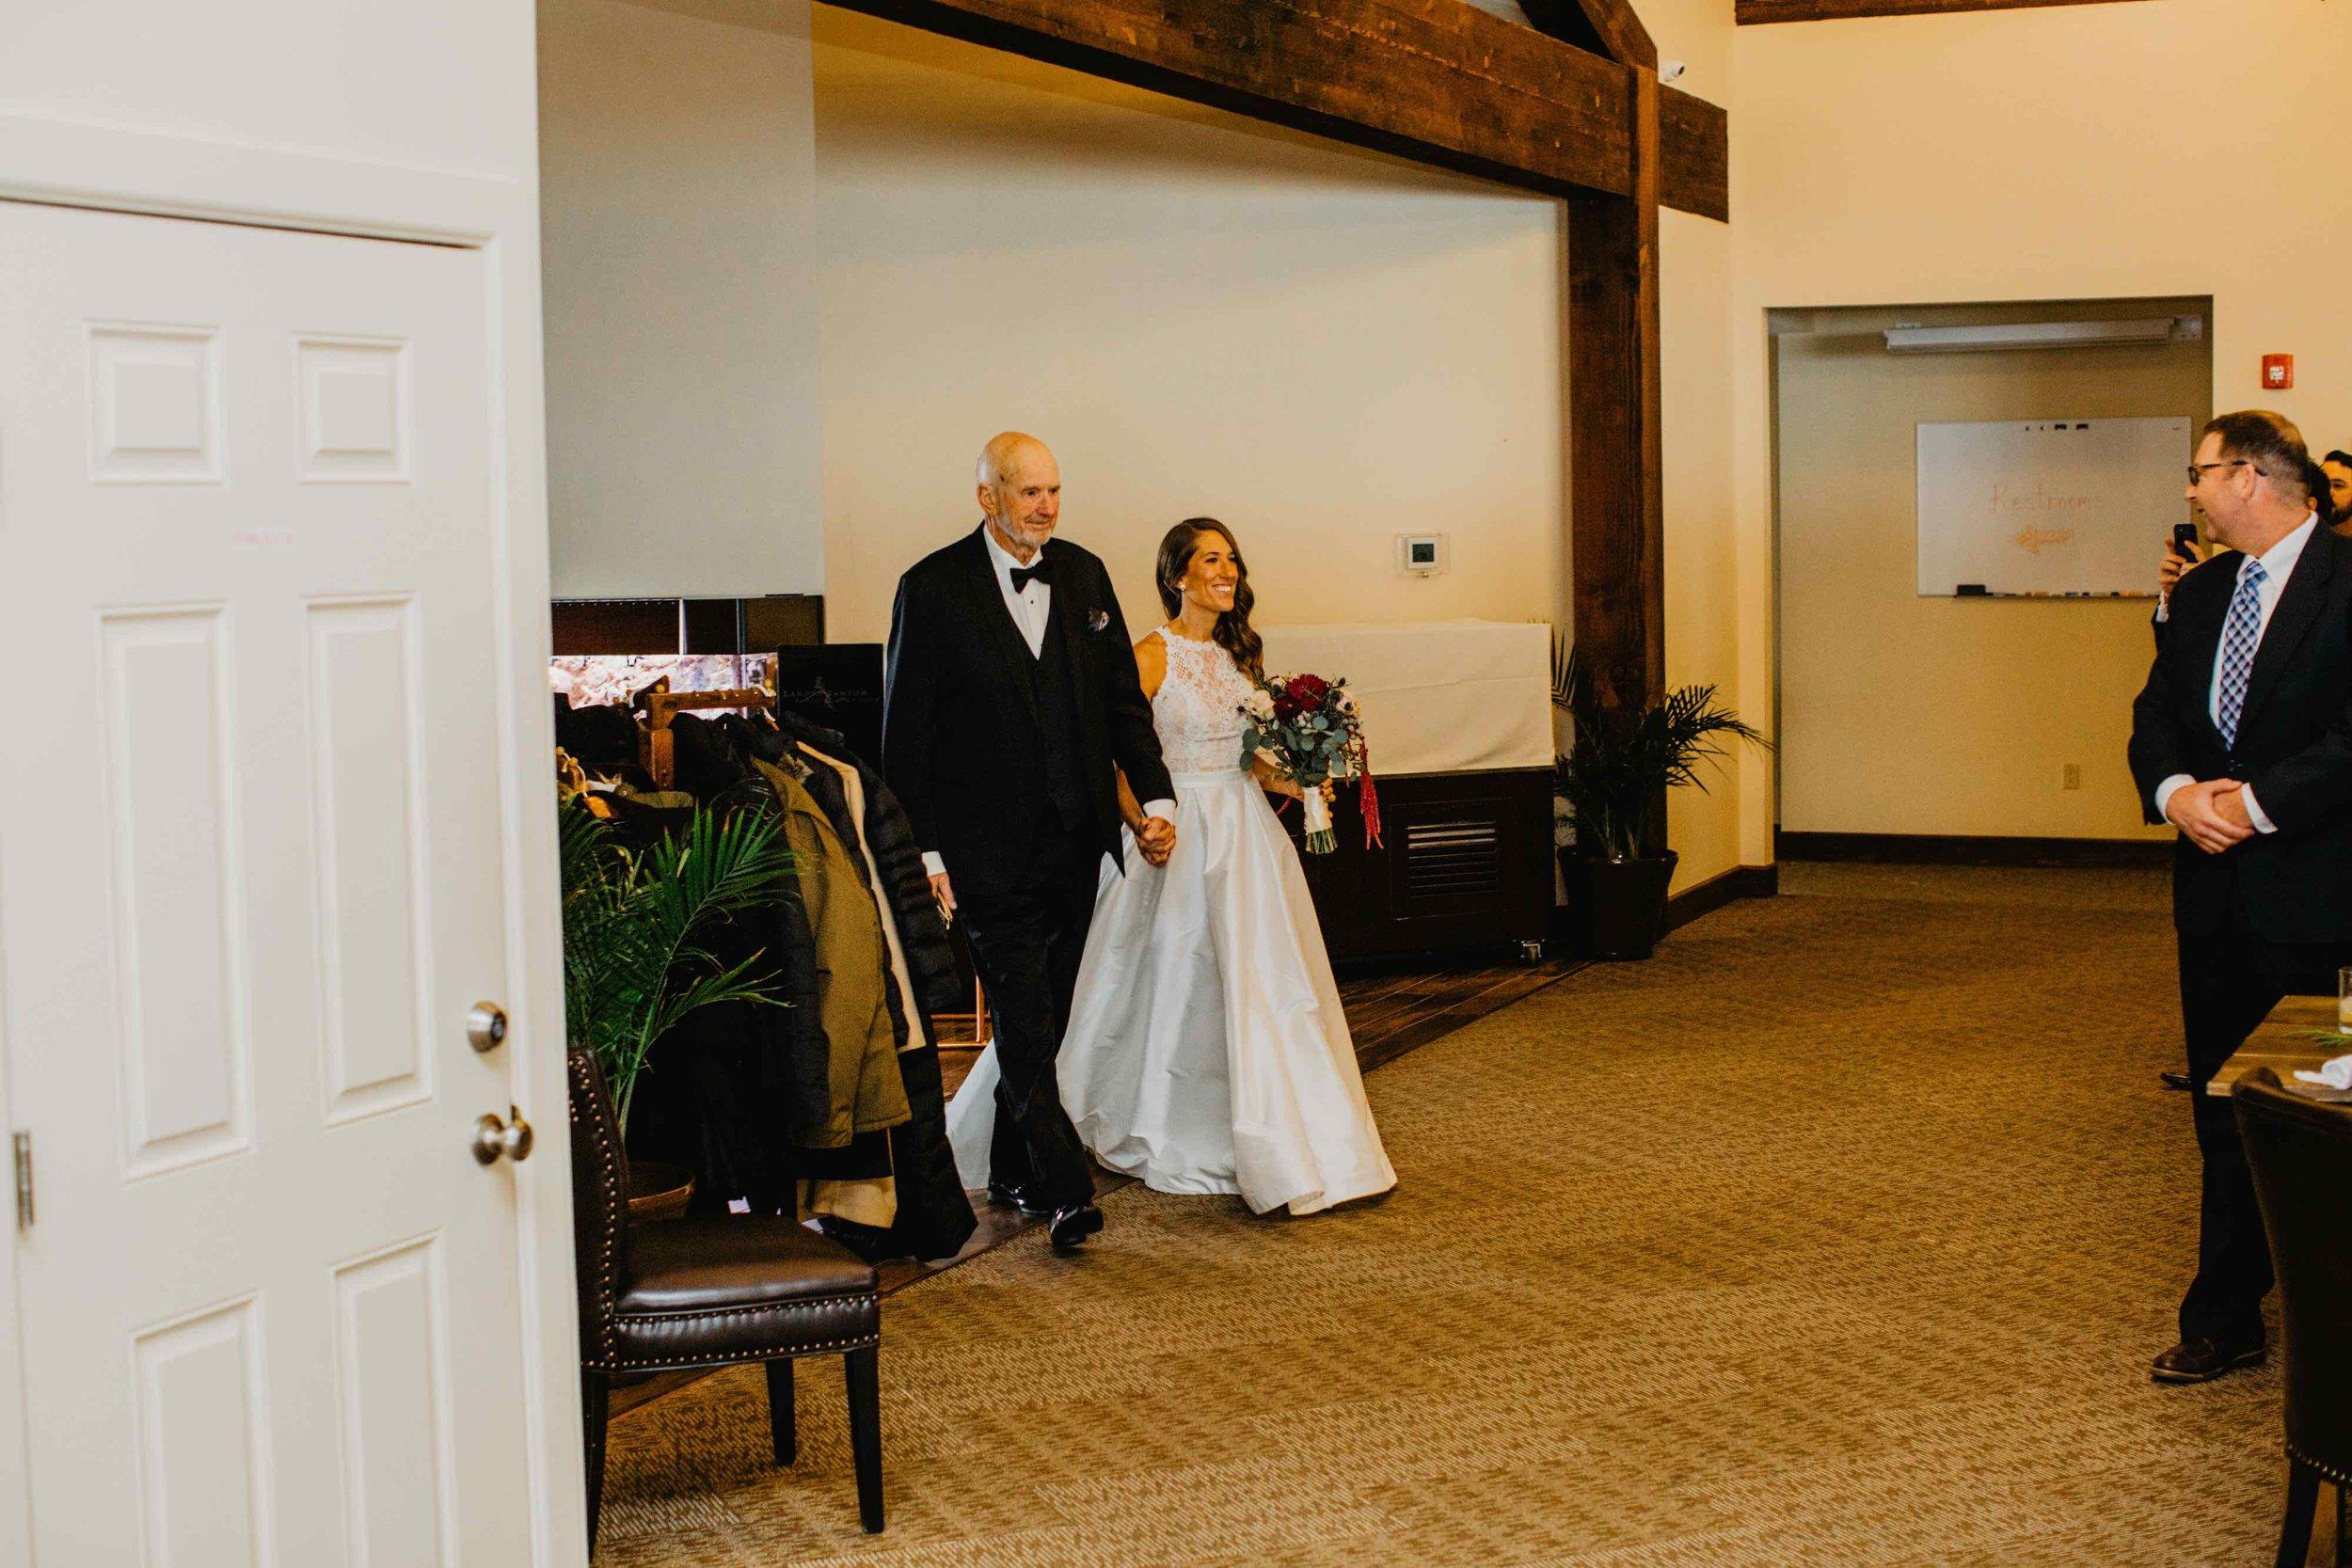 Kisa Conrad Favorites-0008-colorado-wedding-photographer-denver-springs-vailhotel-glenwood-springs-colorado-wedding-photographer.jpeg